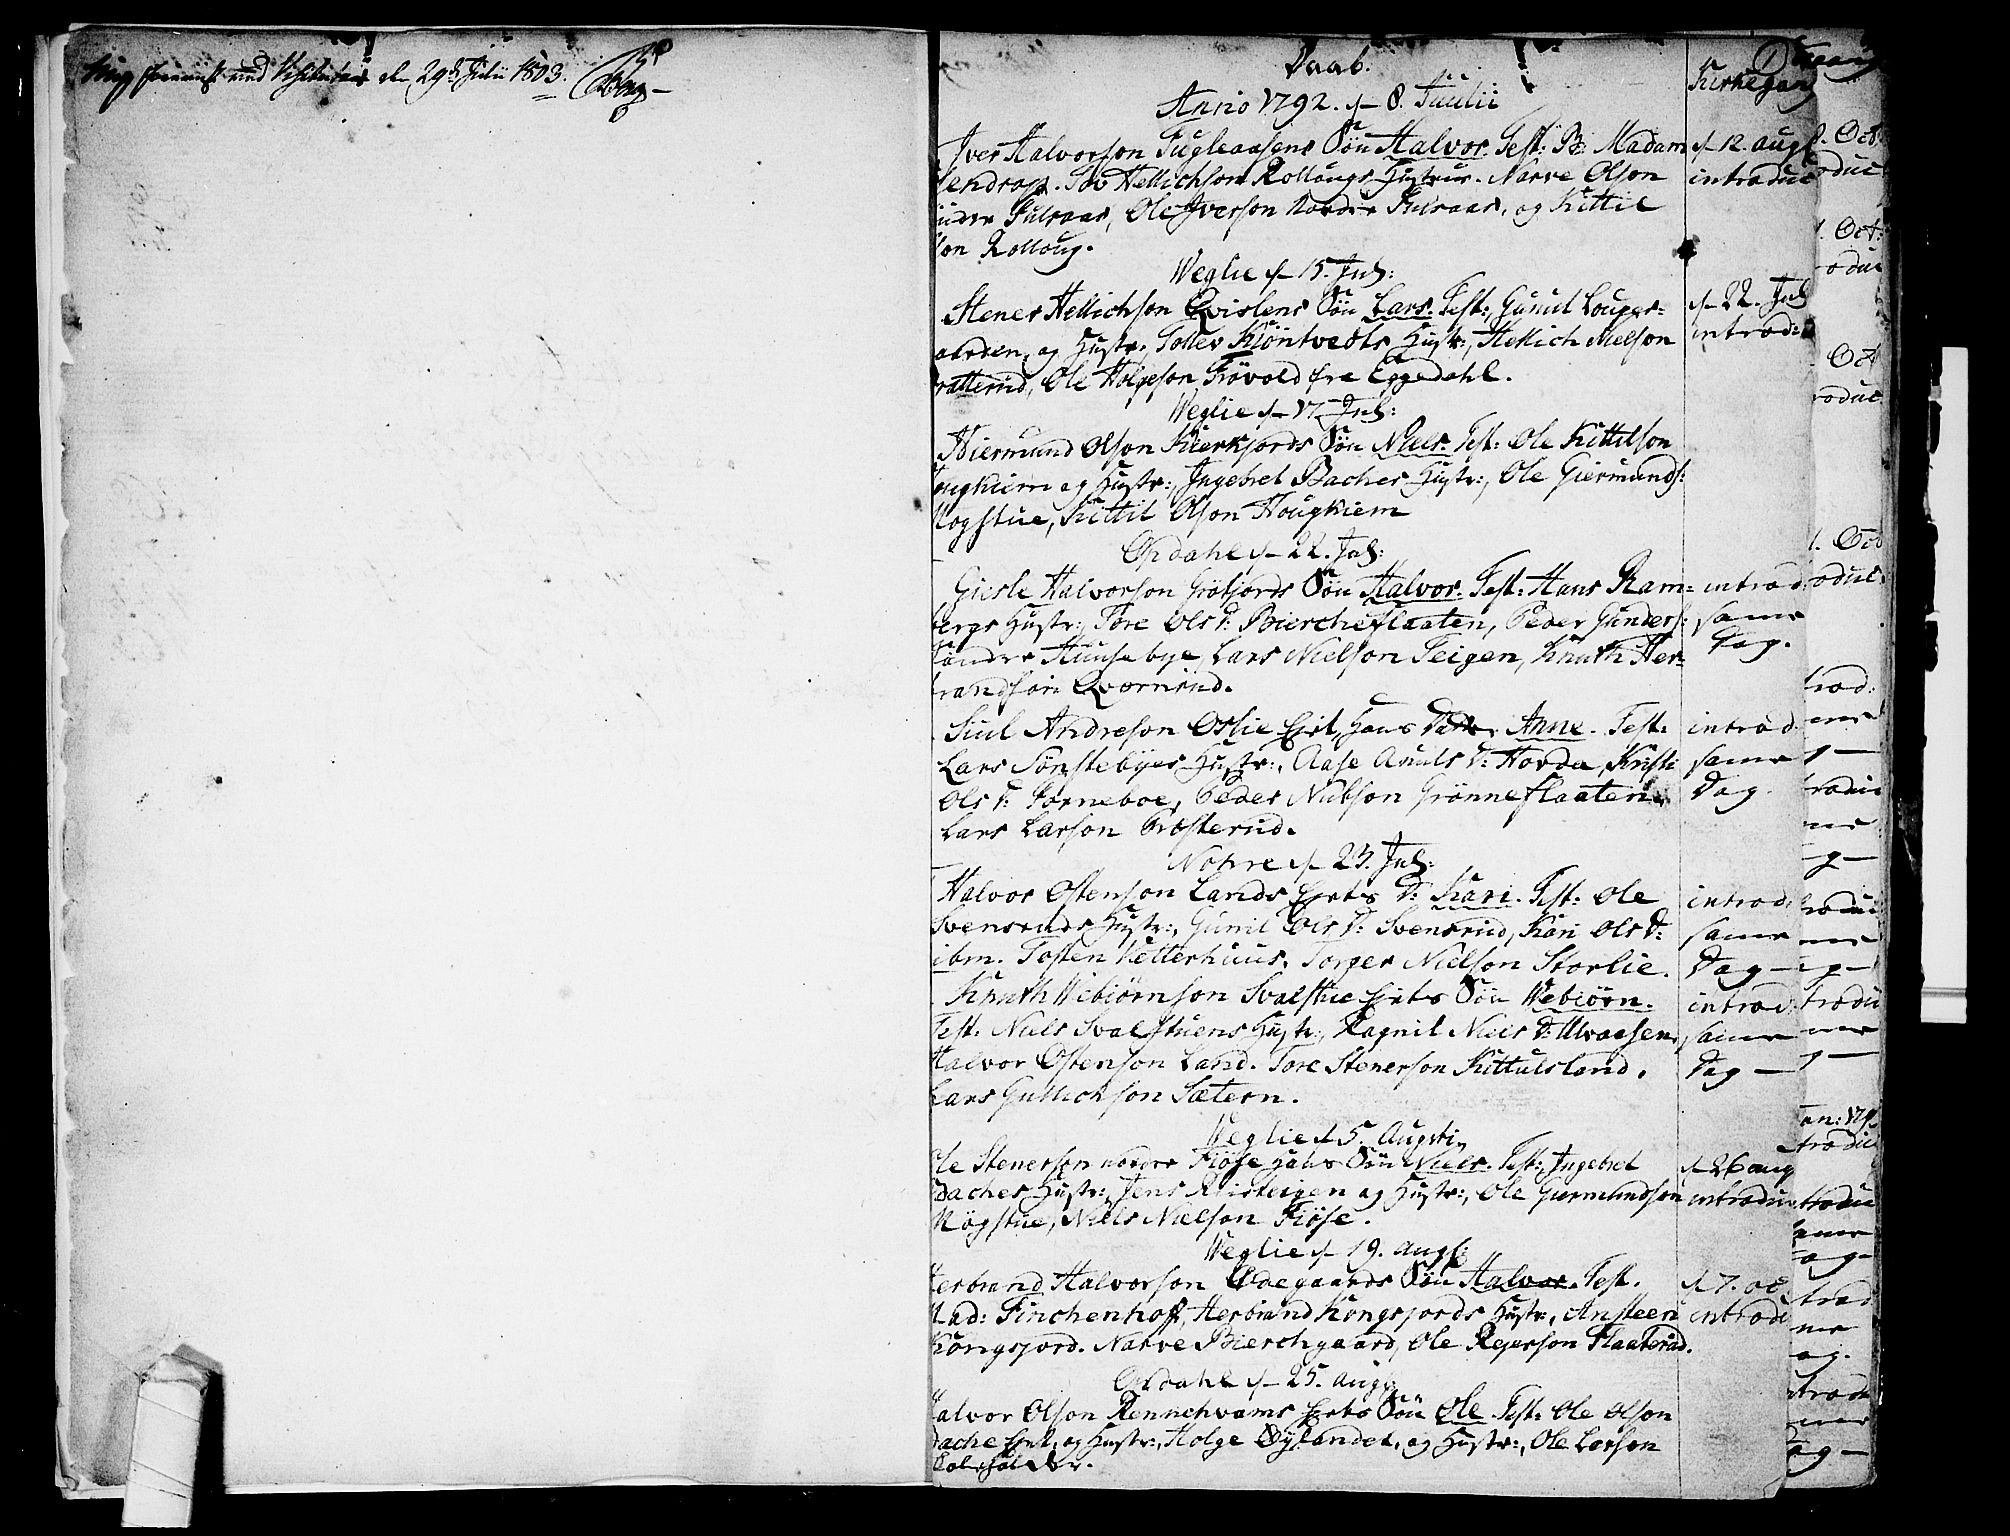 SAKO, Rollag kirkebøker, F/Fa/L0005: Ministerialbok nr. I 5, 1792-1814, s. 0-1